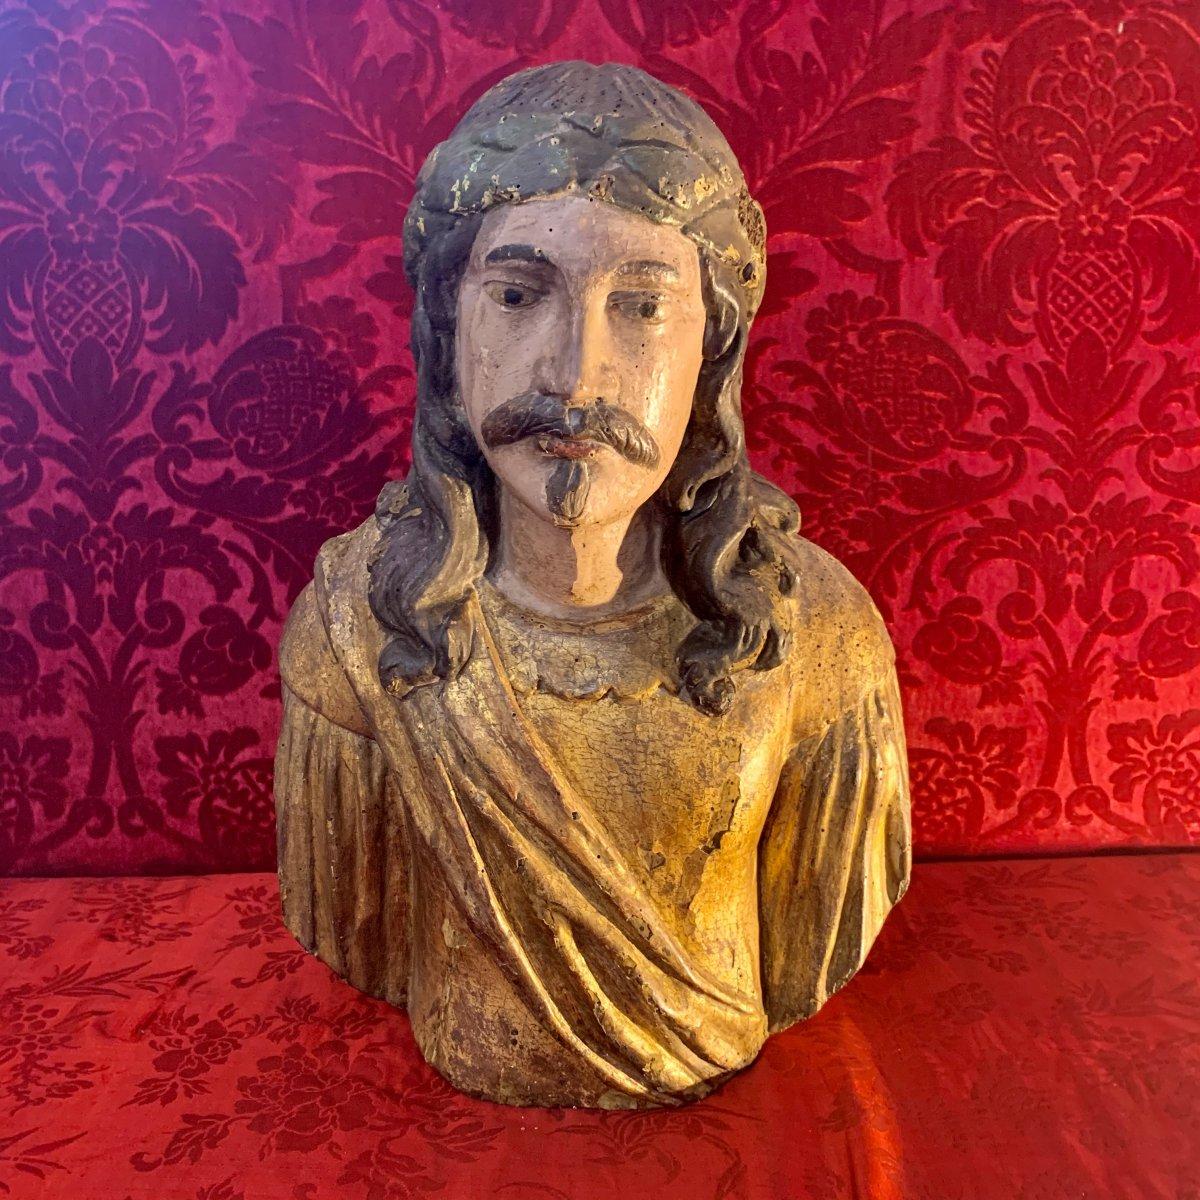 Grand Buste En Bois Doré Espagne XVIIe Siècle